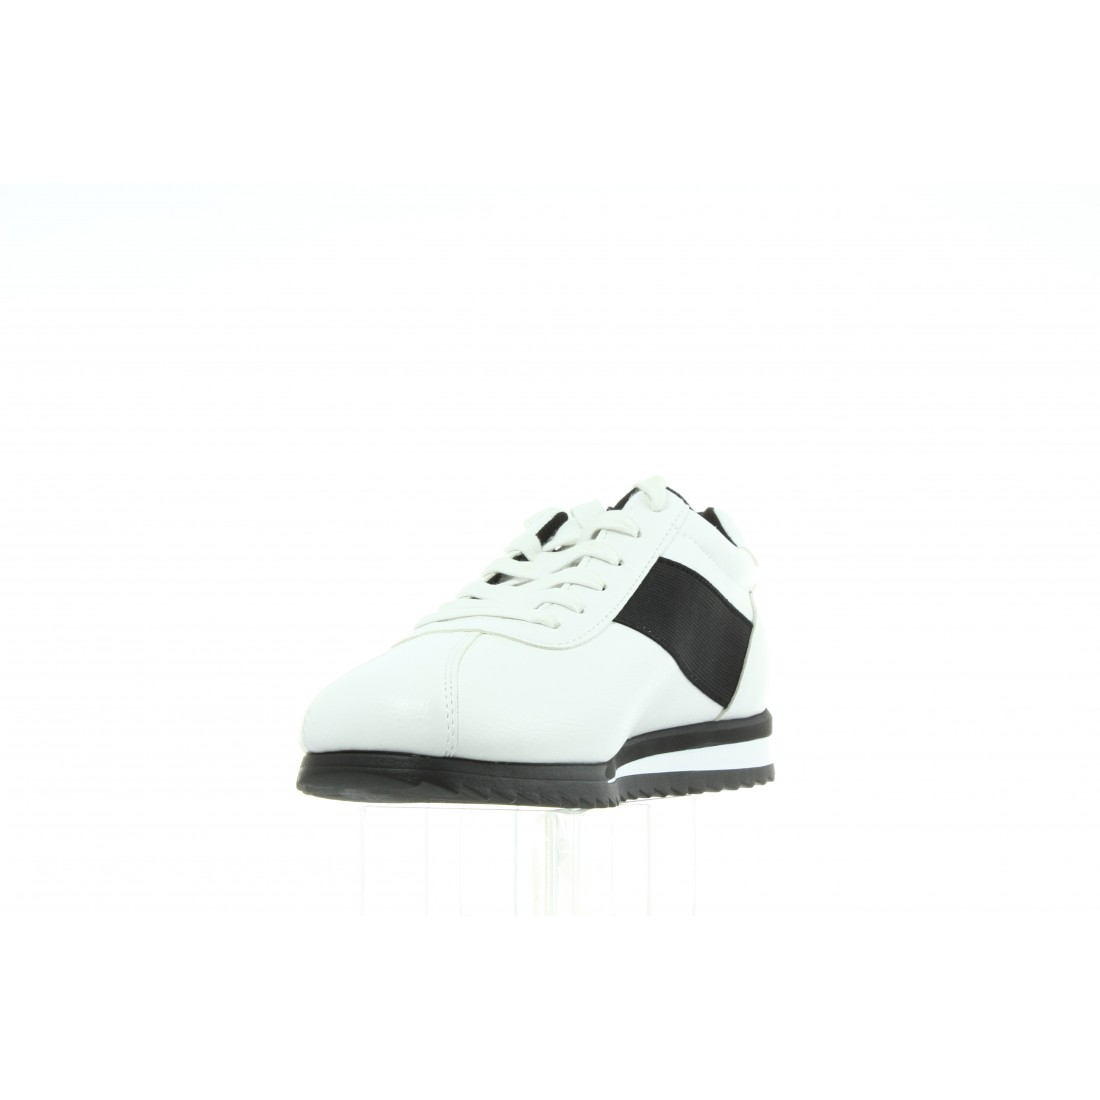 S0499 White Black Biały